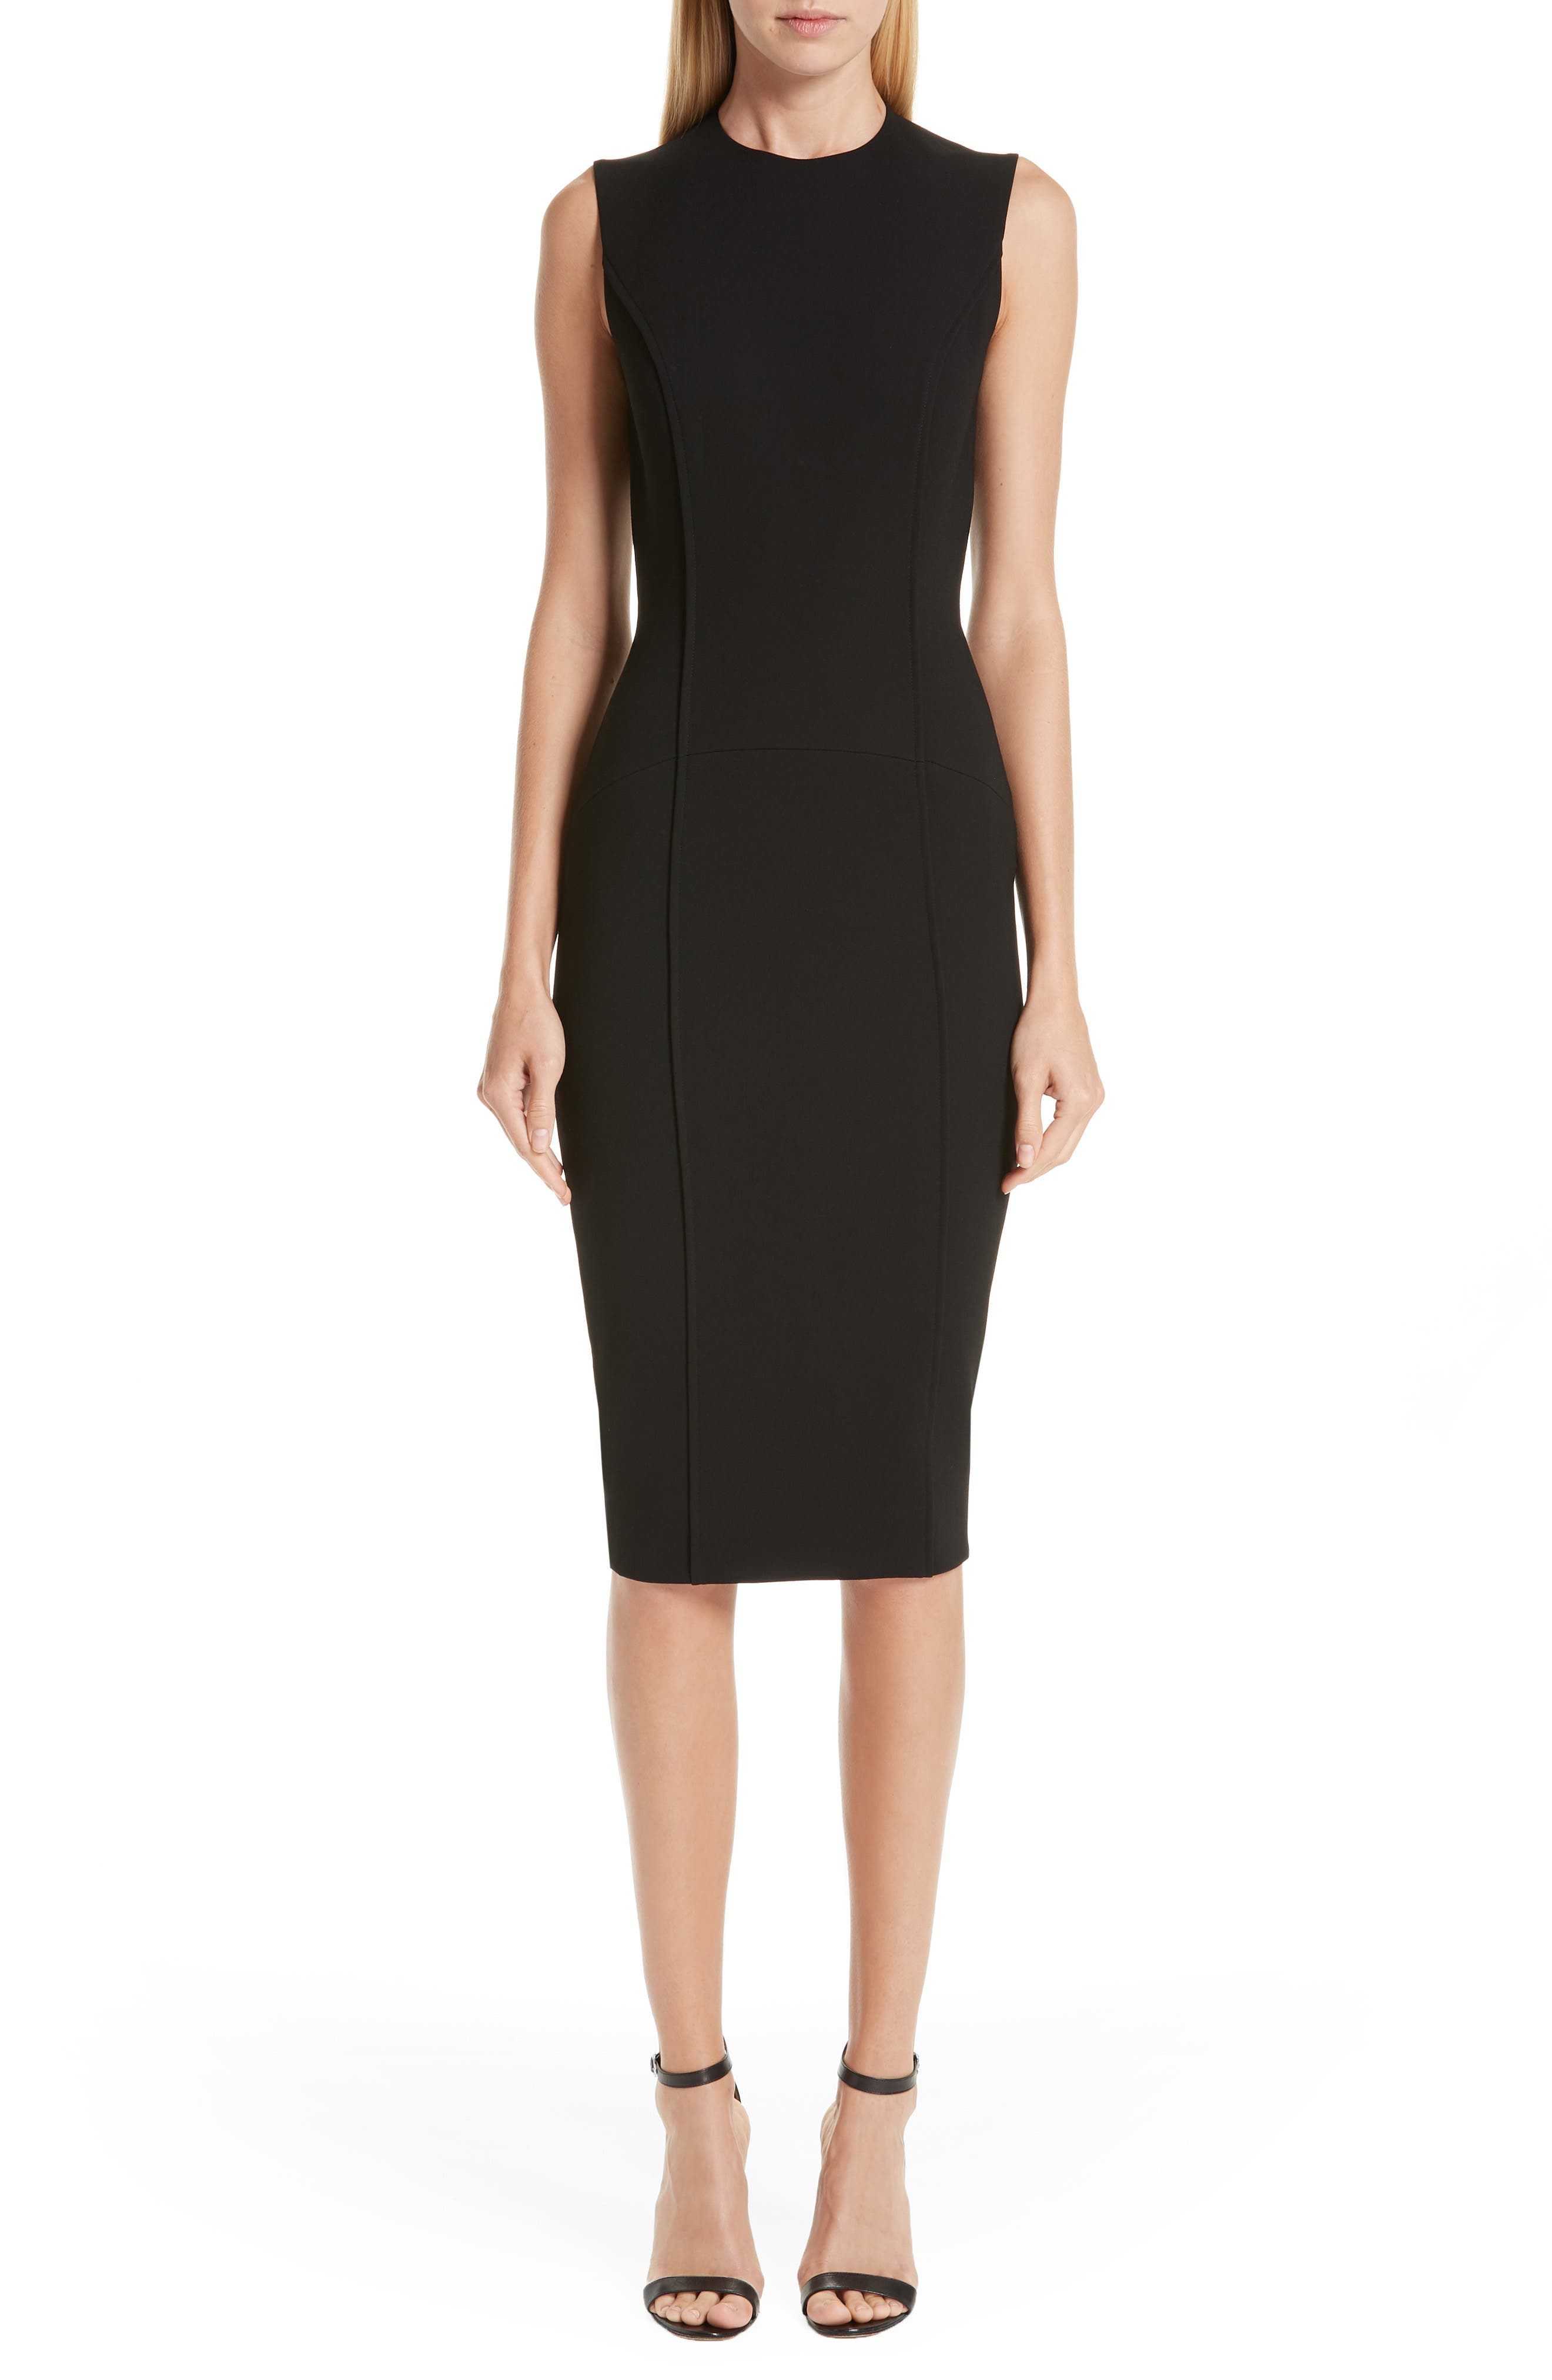 VICTORIA BECKHAM Back Zip Body-Con Dress, Main, color, BLACK